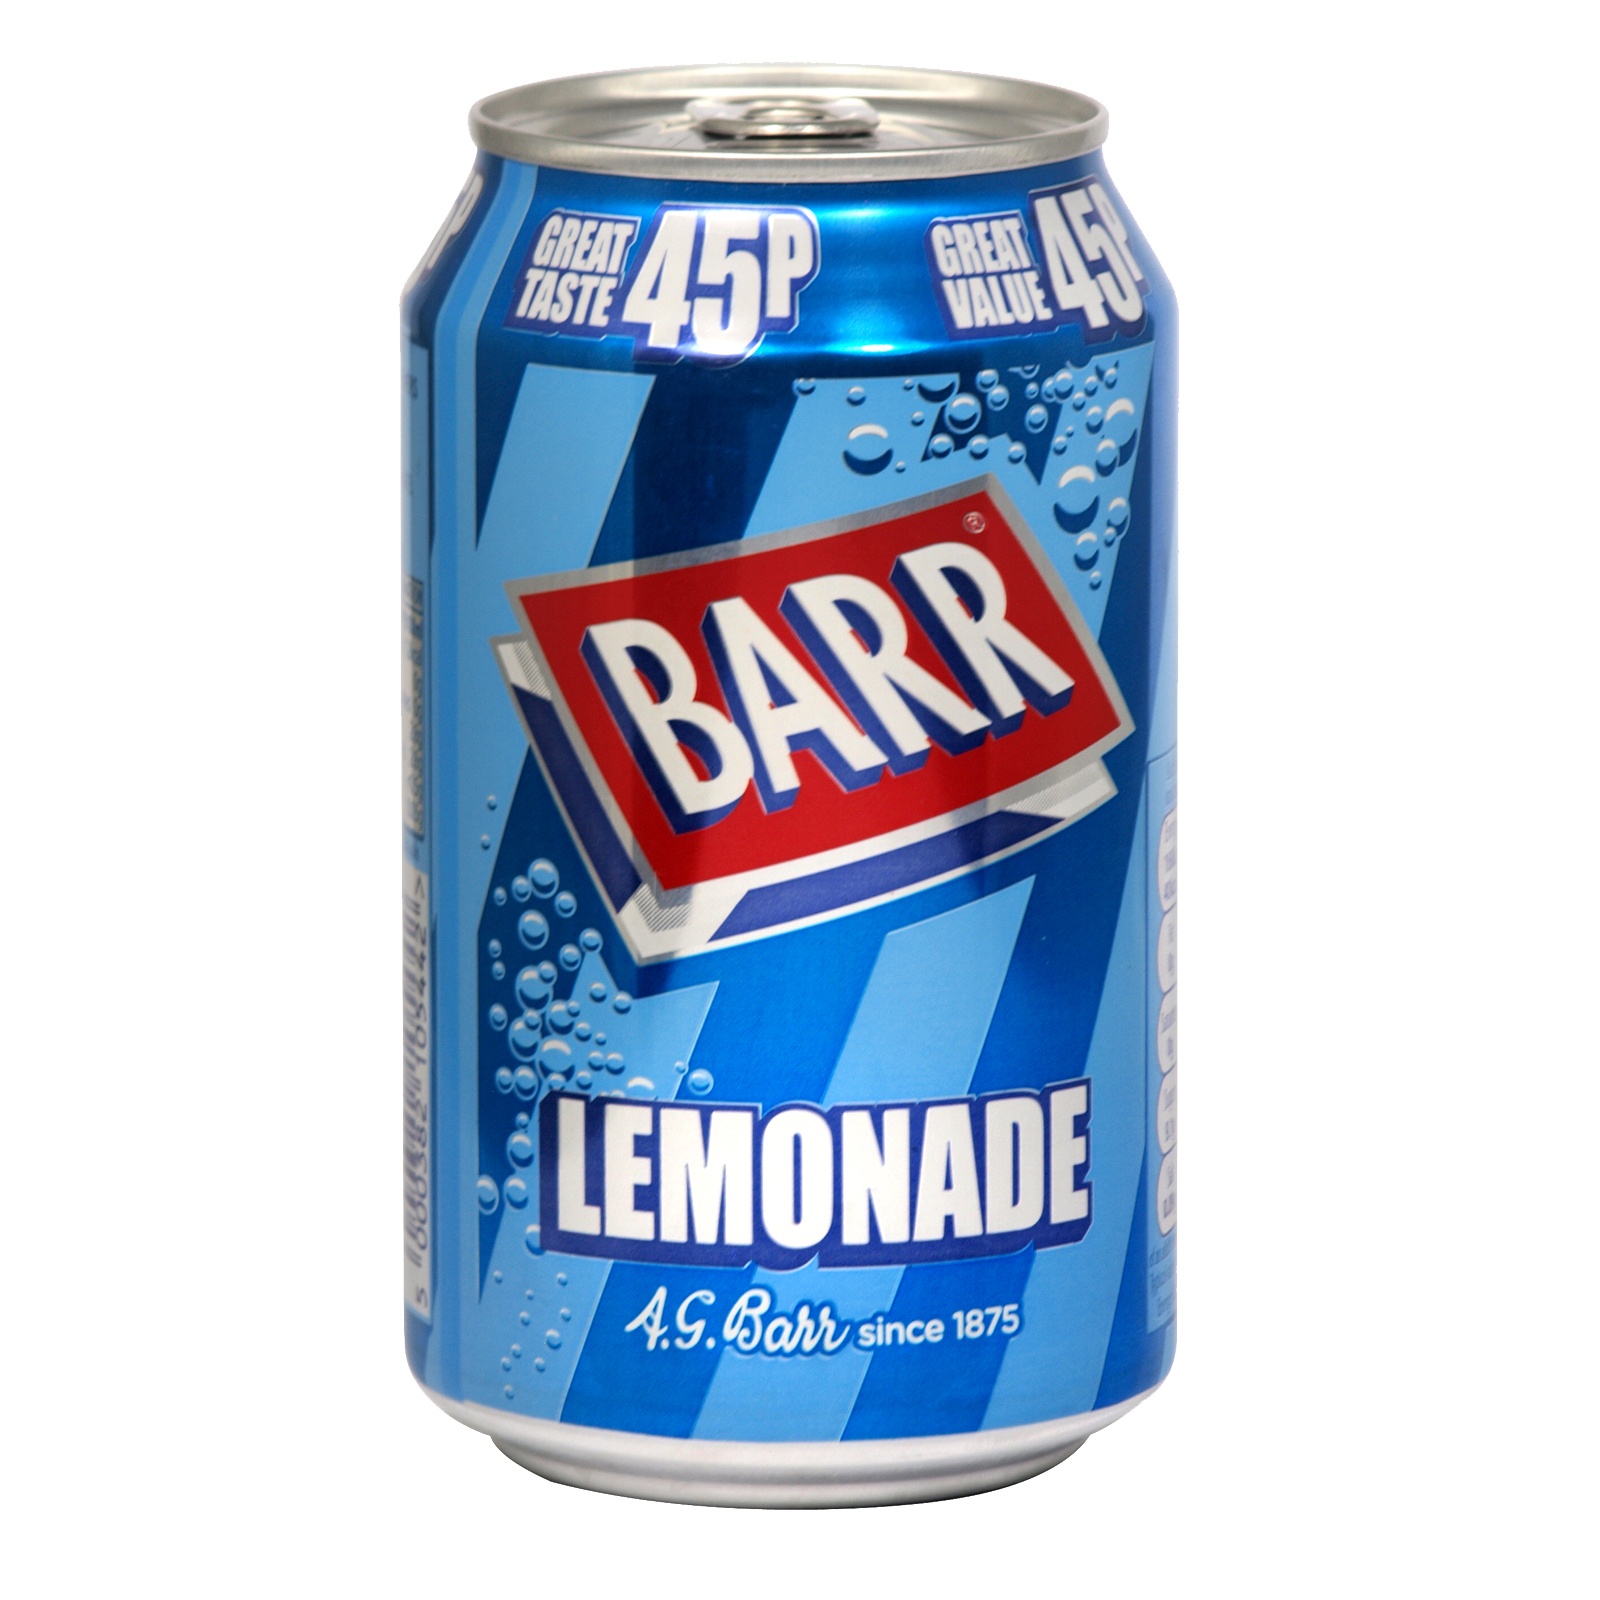 BARR 330ML CANS LEMONADE PM 45P X24